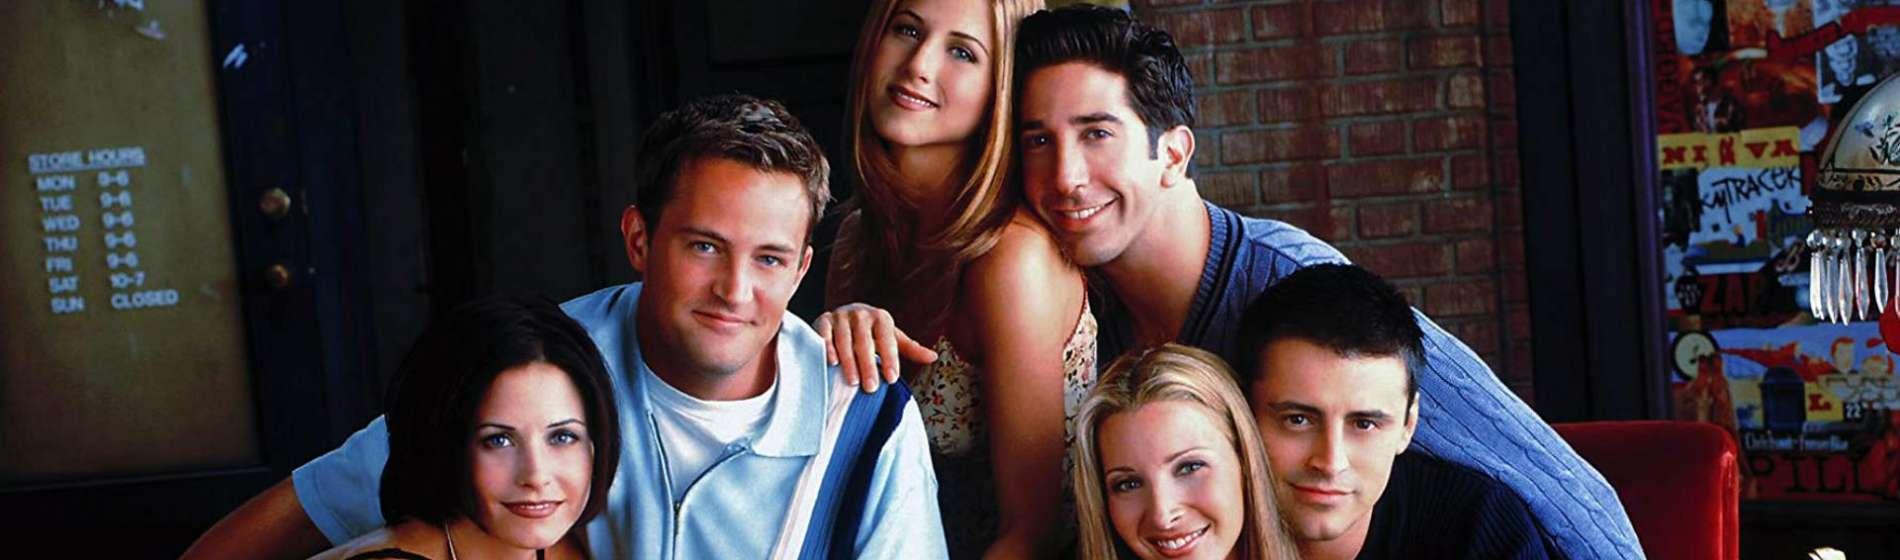 Friends-Entire-Cast